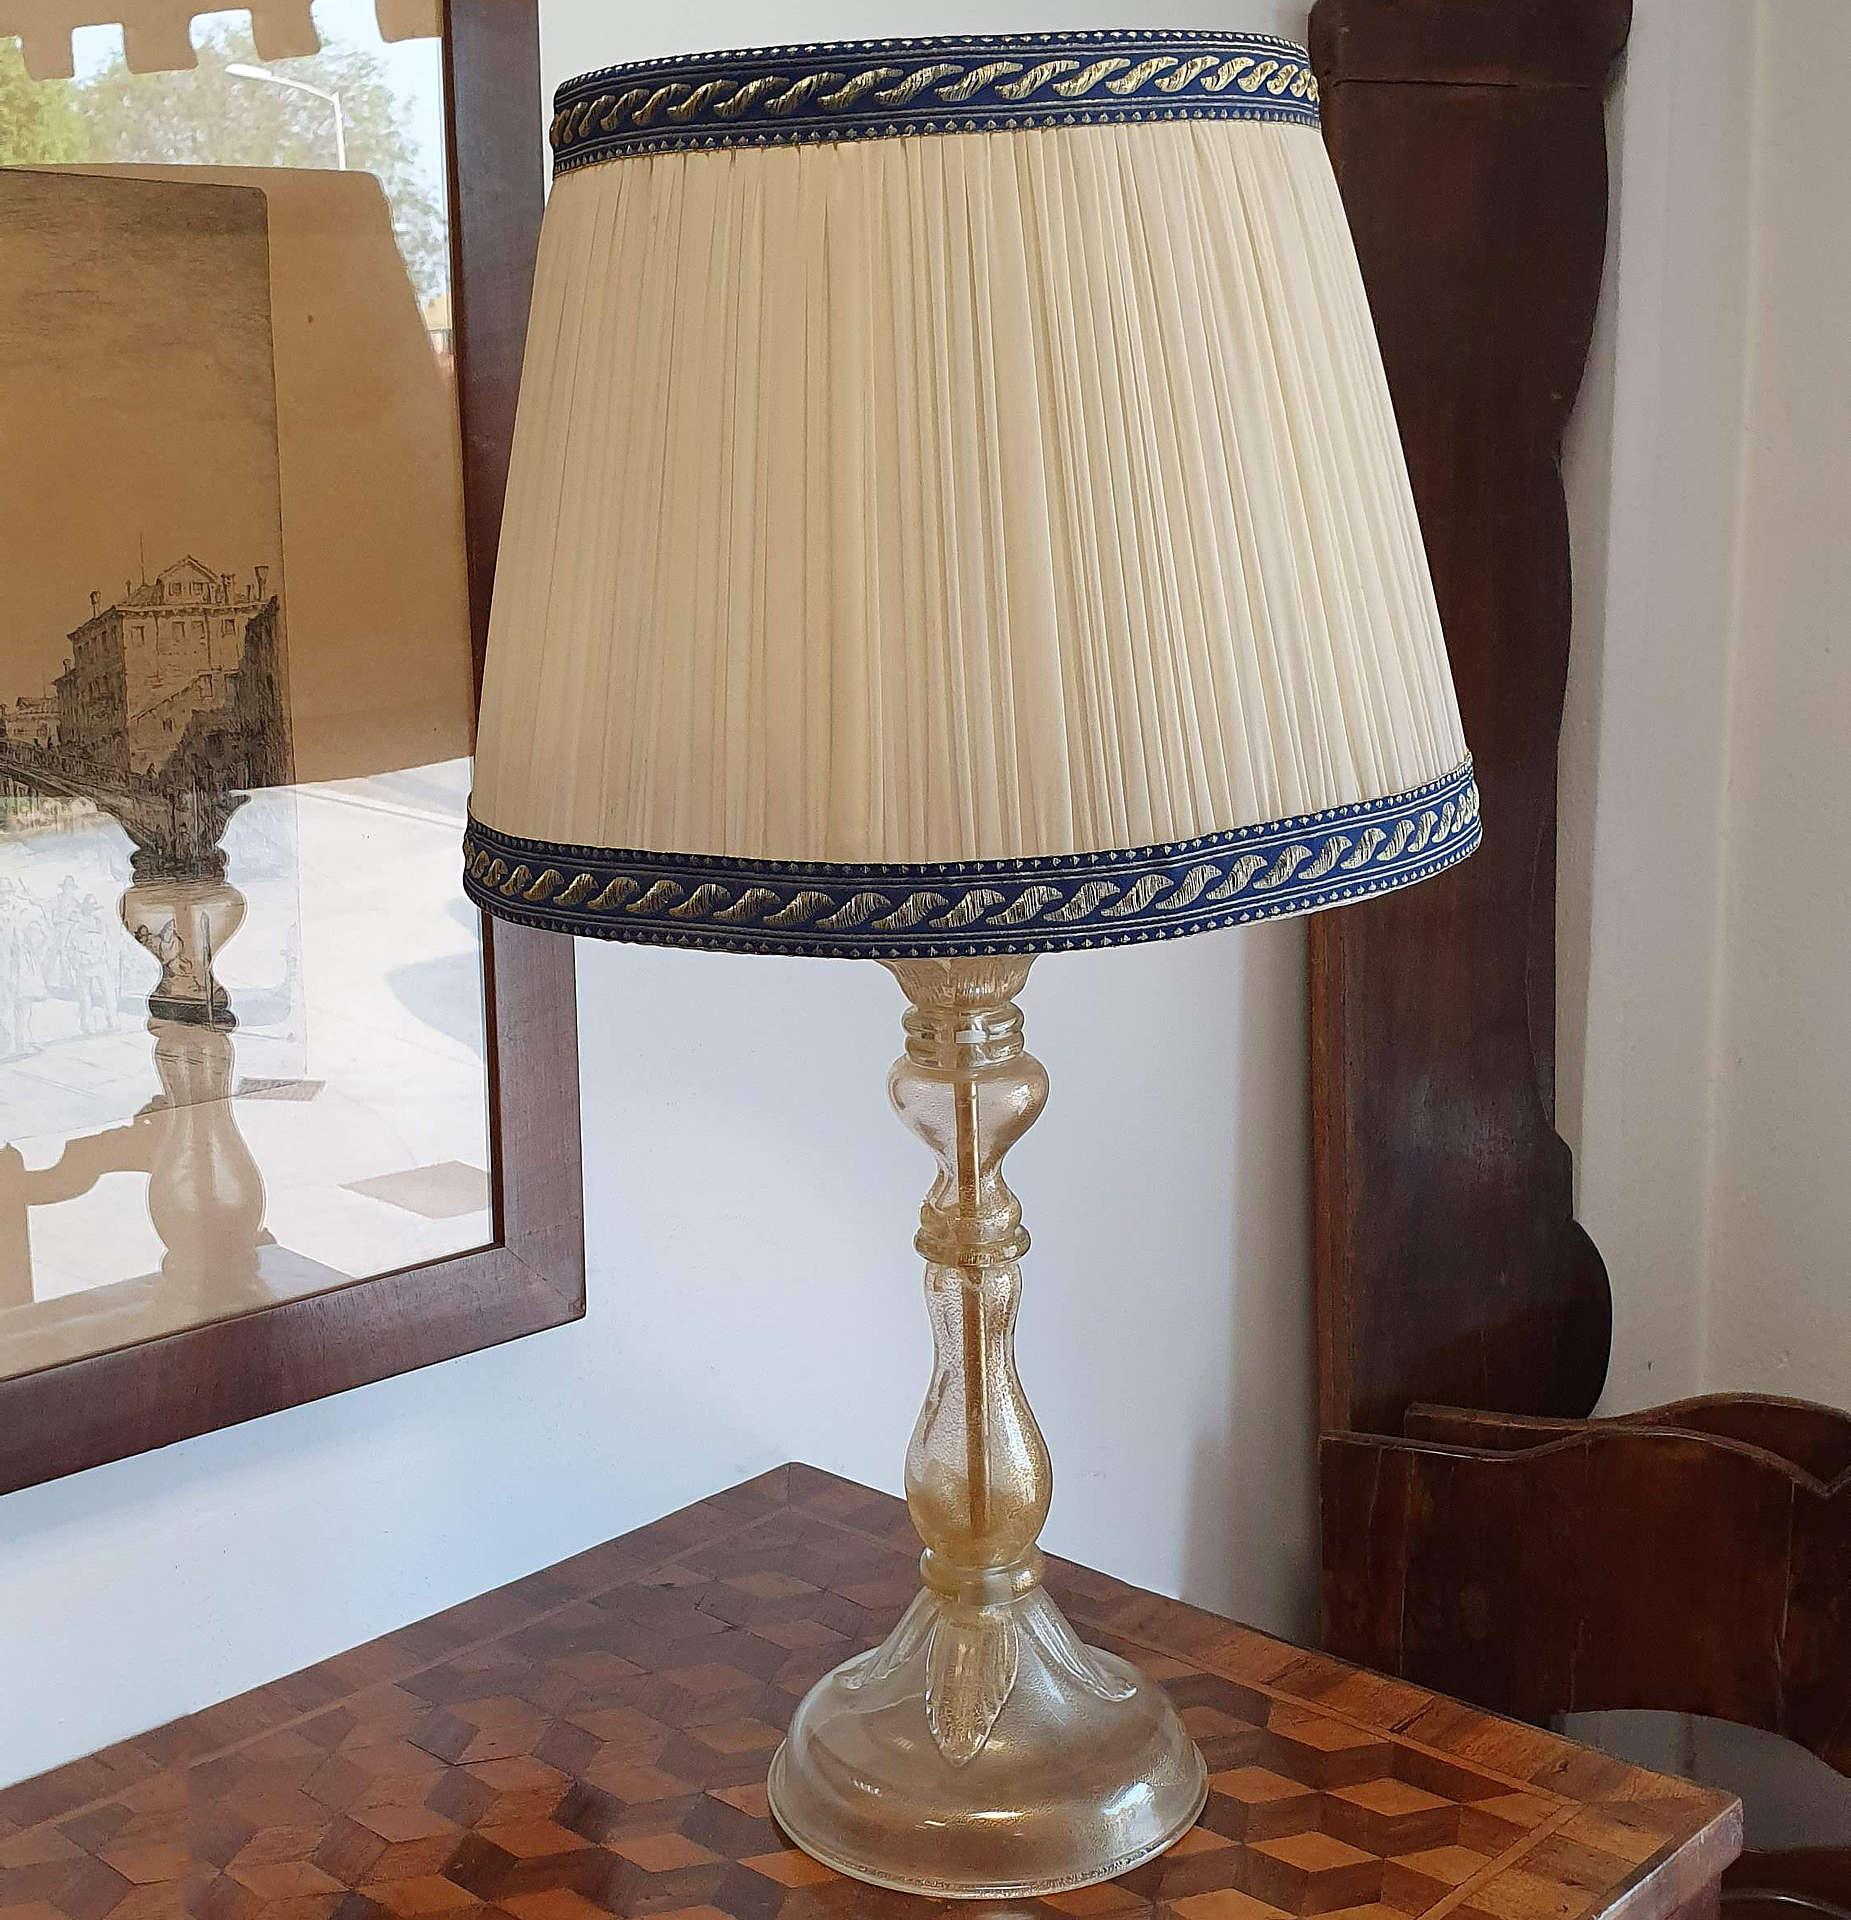 Lampada Murano Anni 30 Lampadario Antico